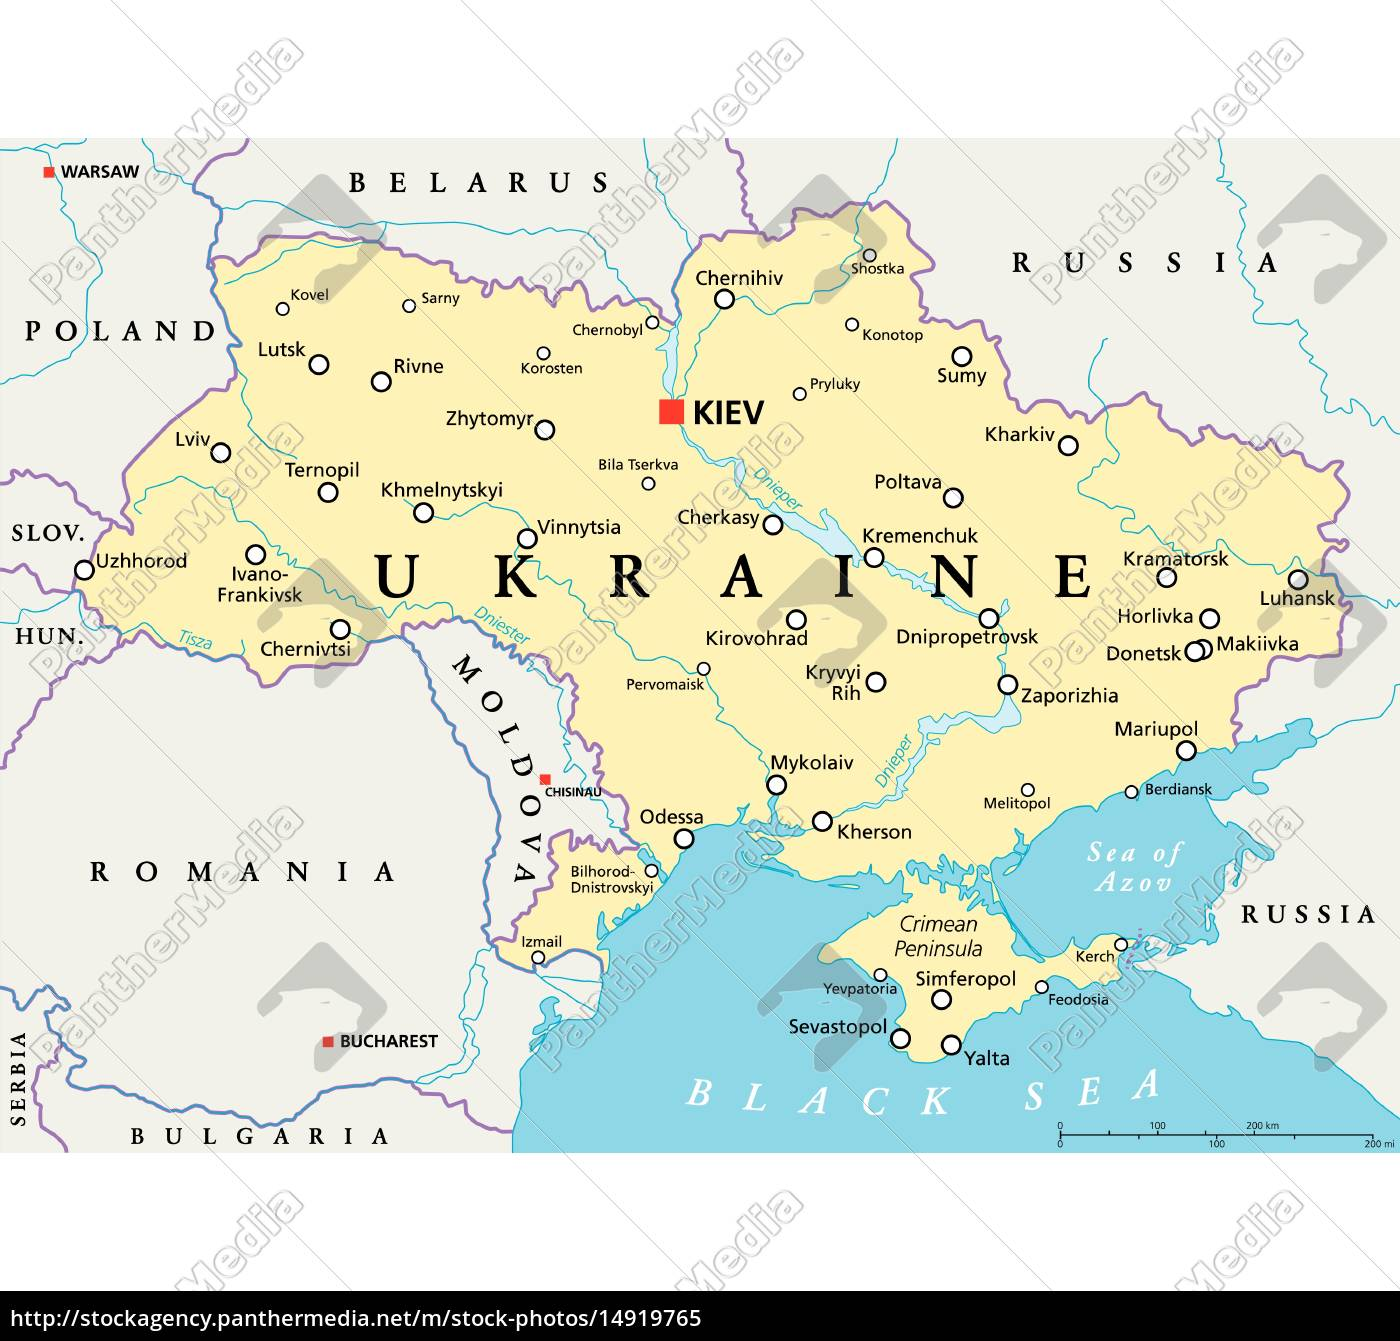 karte ukraine ukraine politische karte   Stockfoto   #14919765   Bildagentur